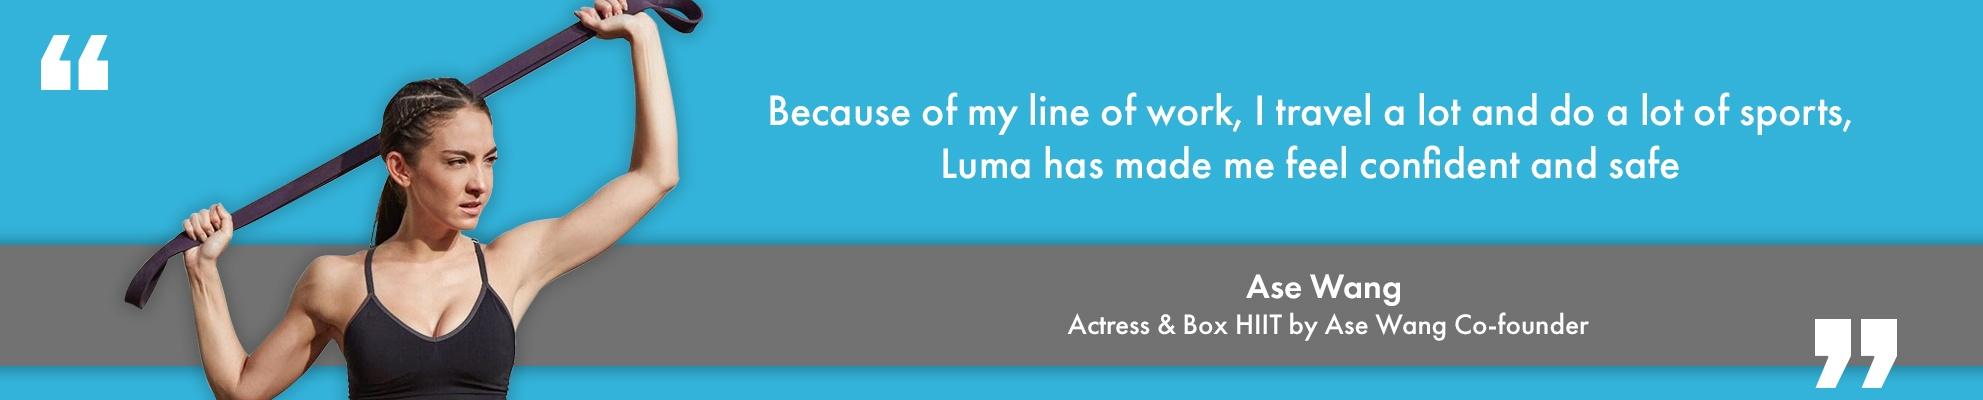 Ase Wang Luma Testimonial